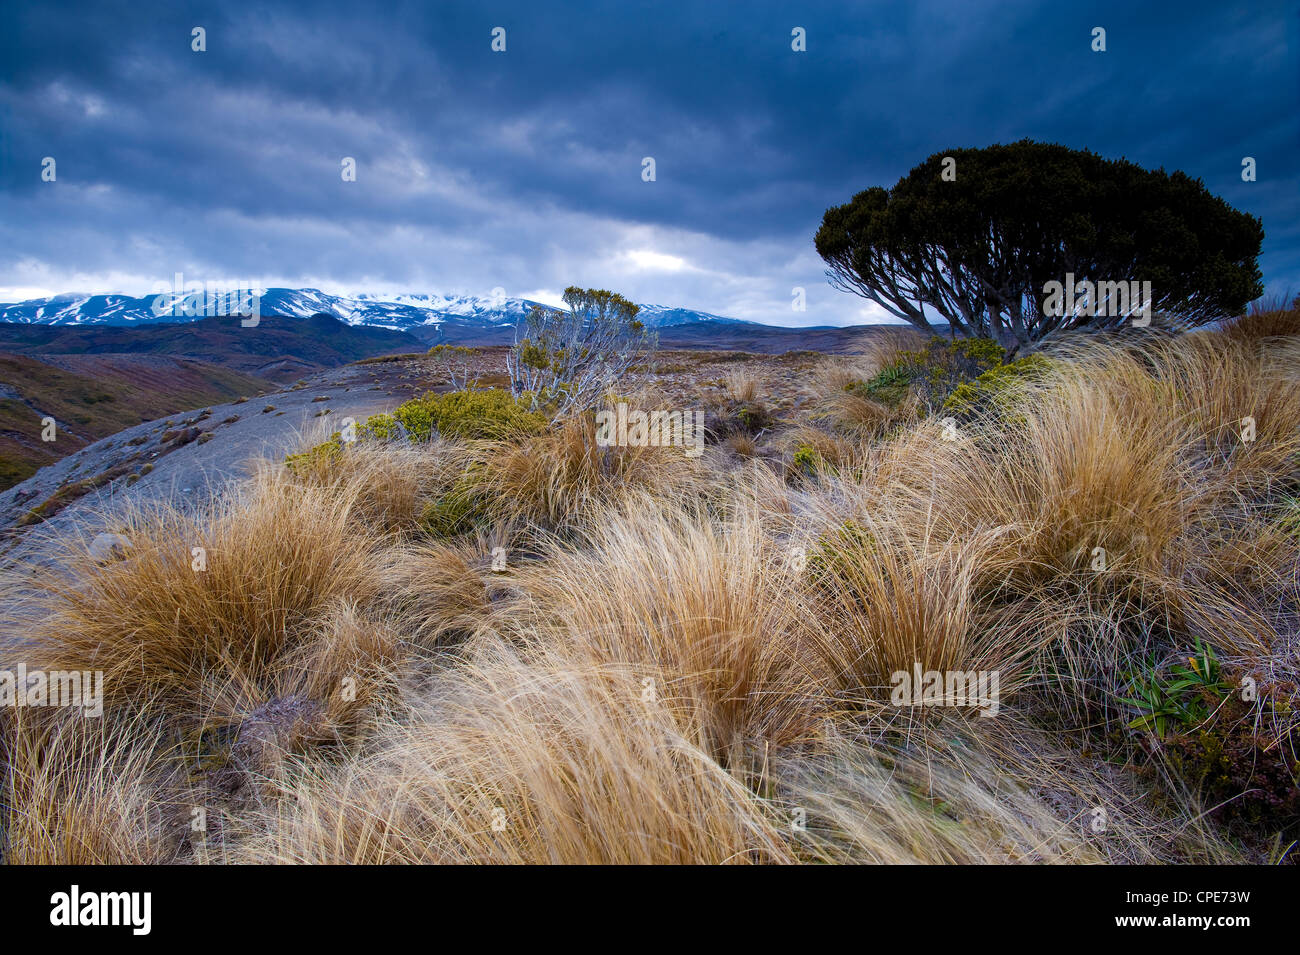 Tongariro National Park, UNESCO World Heritage Site, North Island, New Zealand, Pacific - Stock Image